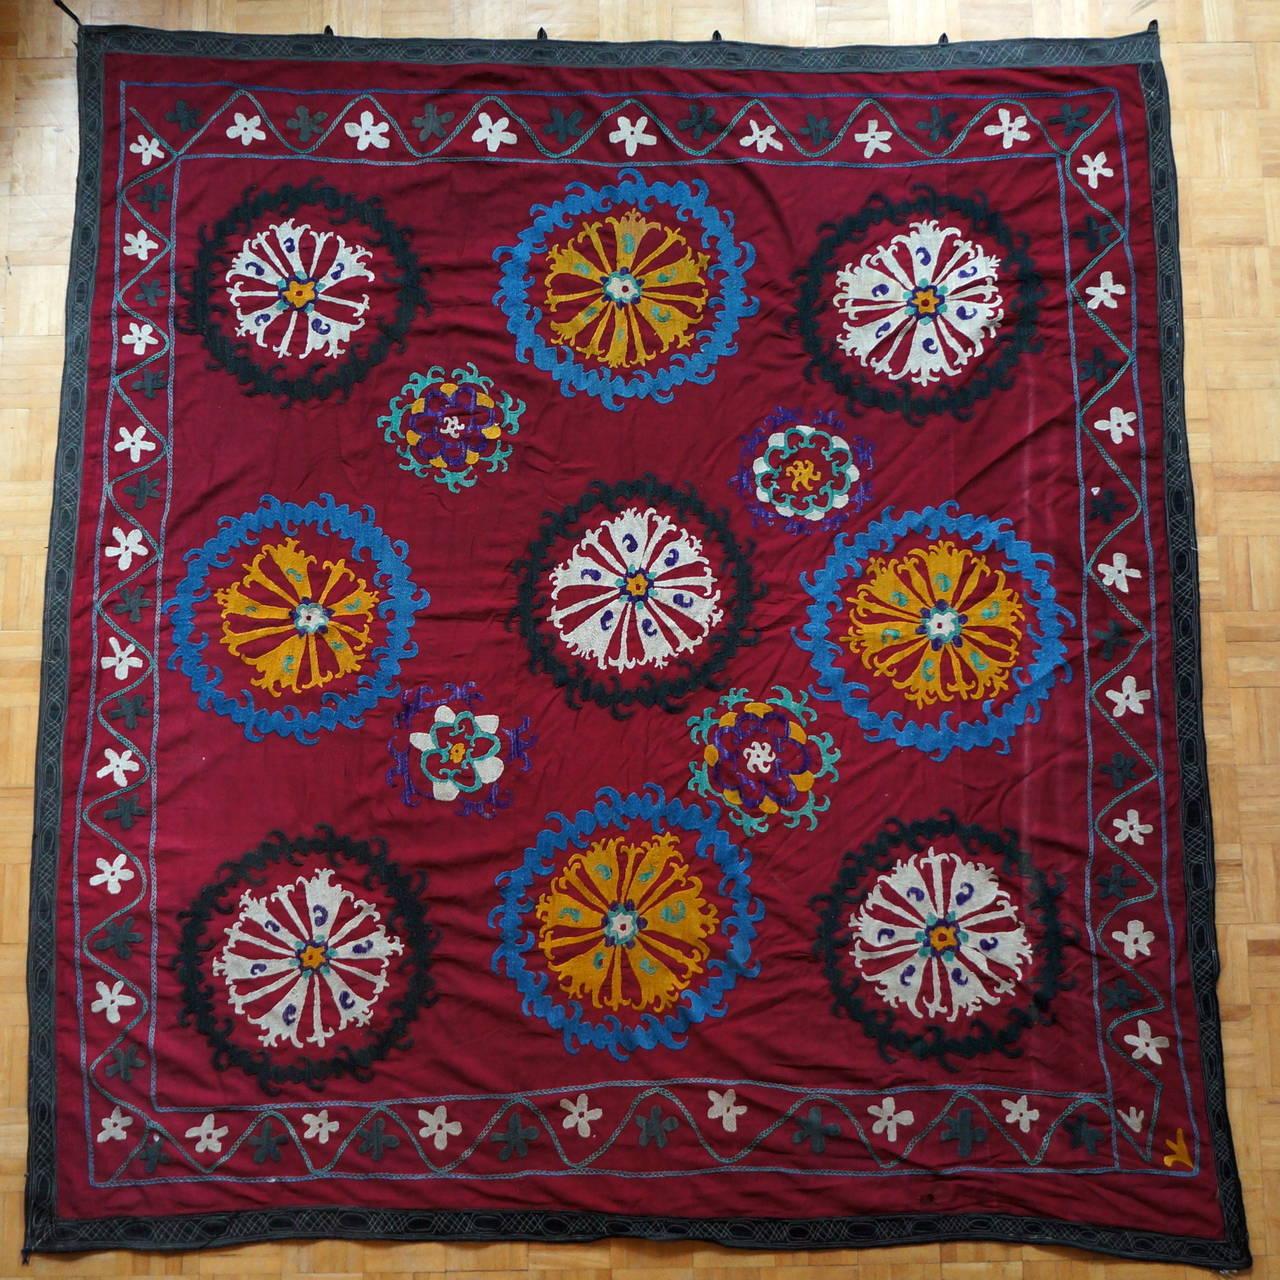 20th Century Large Vintage Uzbek Suzani Needlework Textile Blanket or Tapestry For Sale